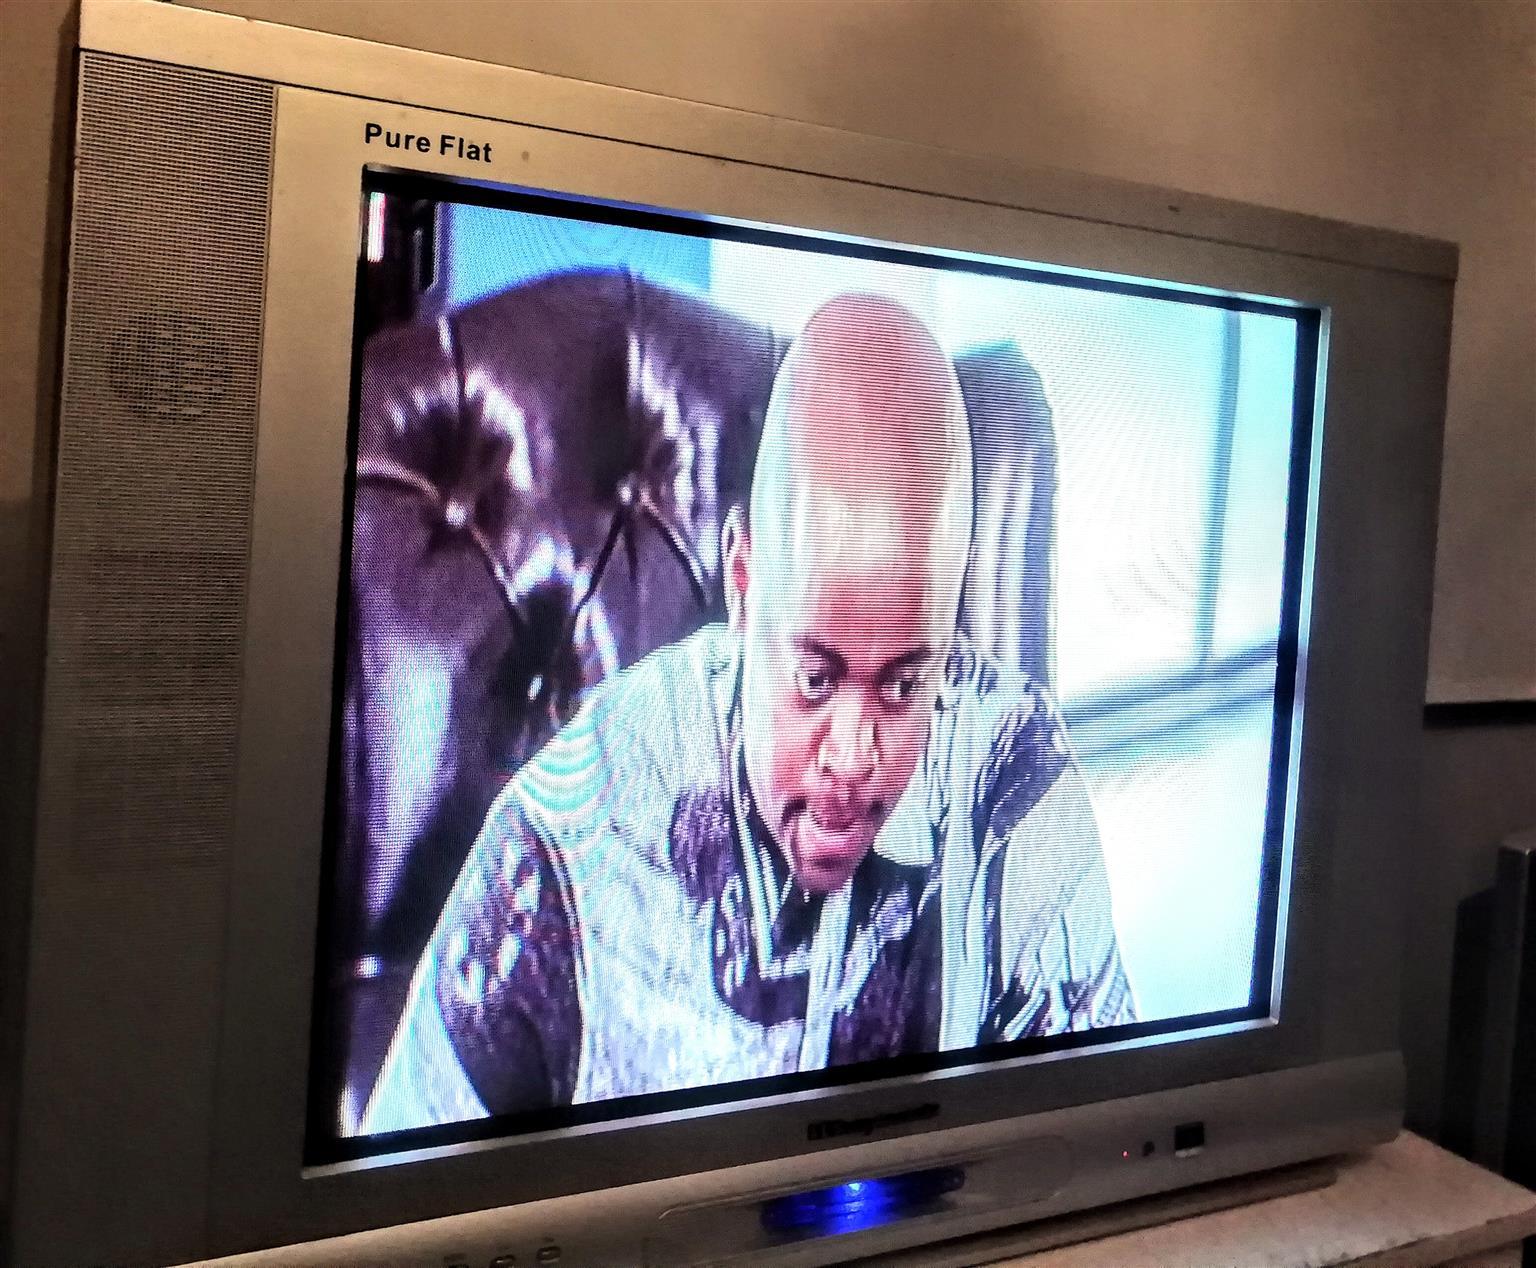 74 cm Wharfedale pure flat tv